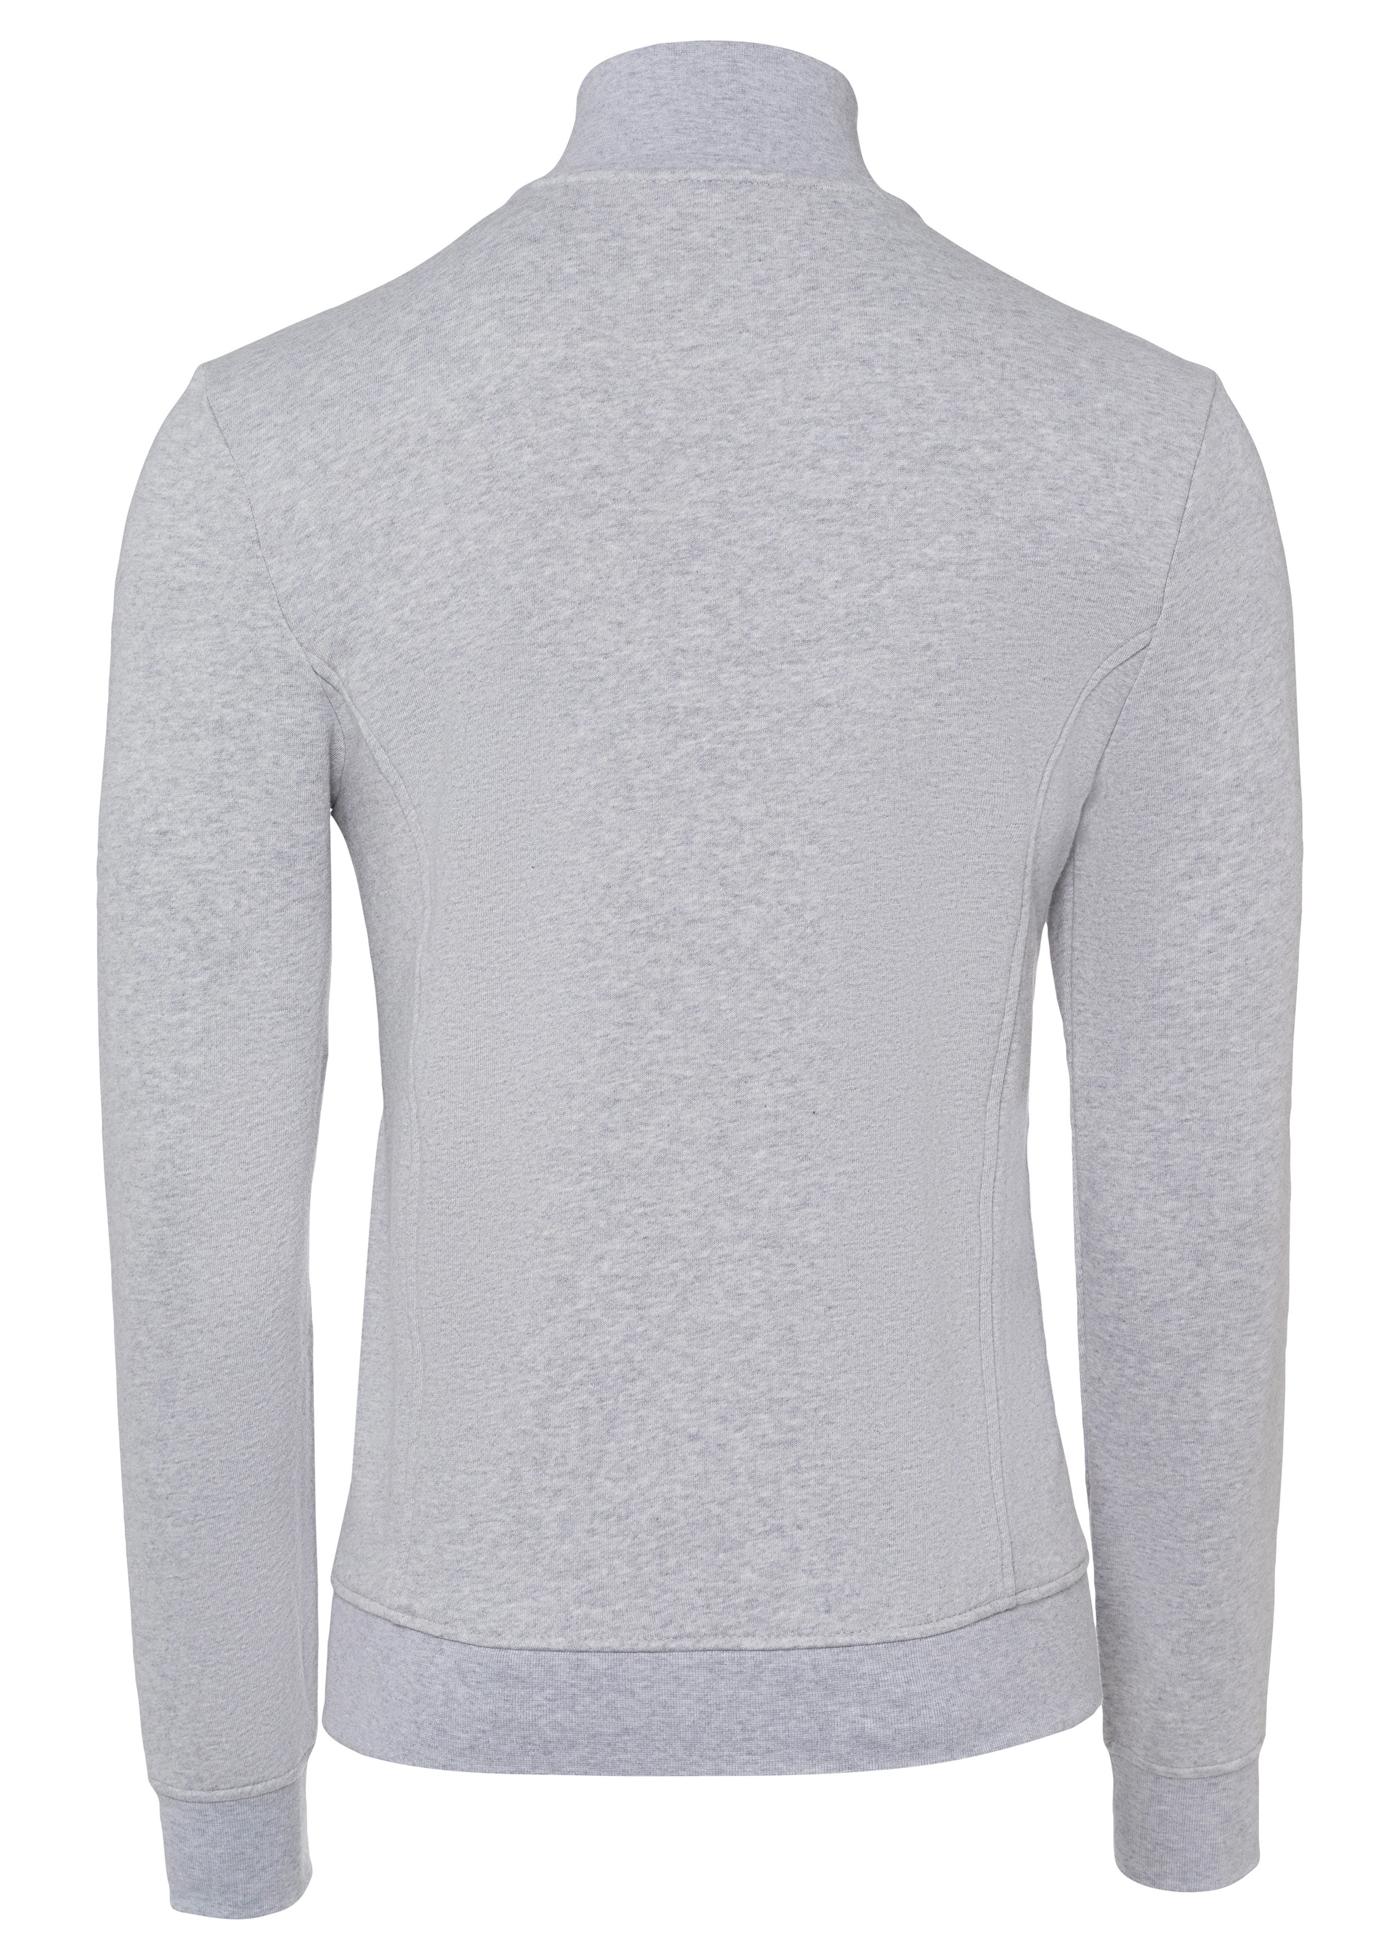 Sweatshirt image number 1